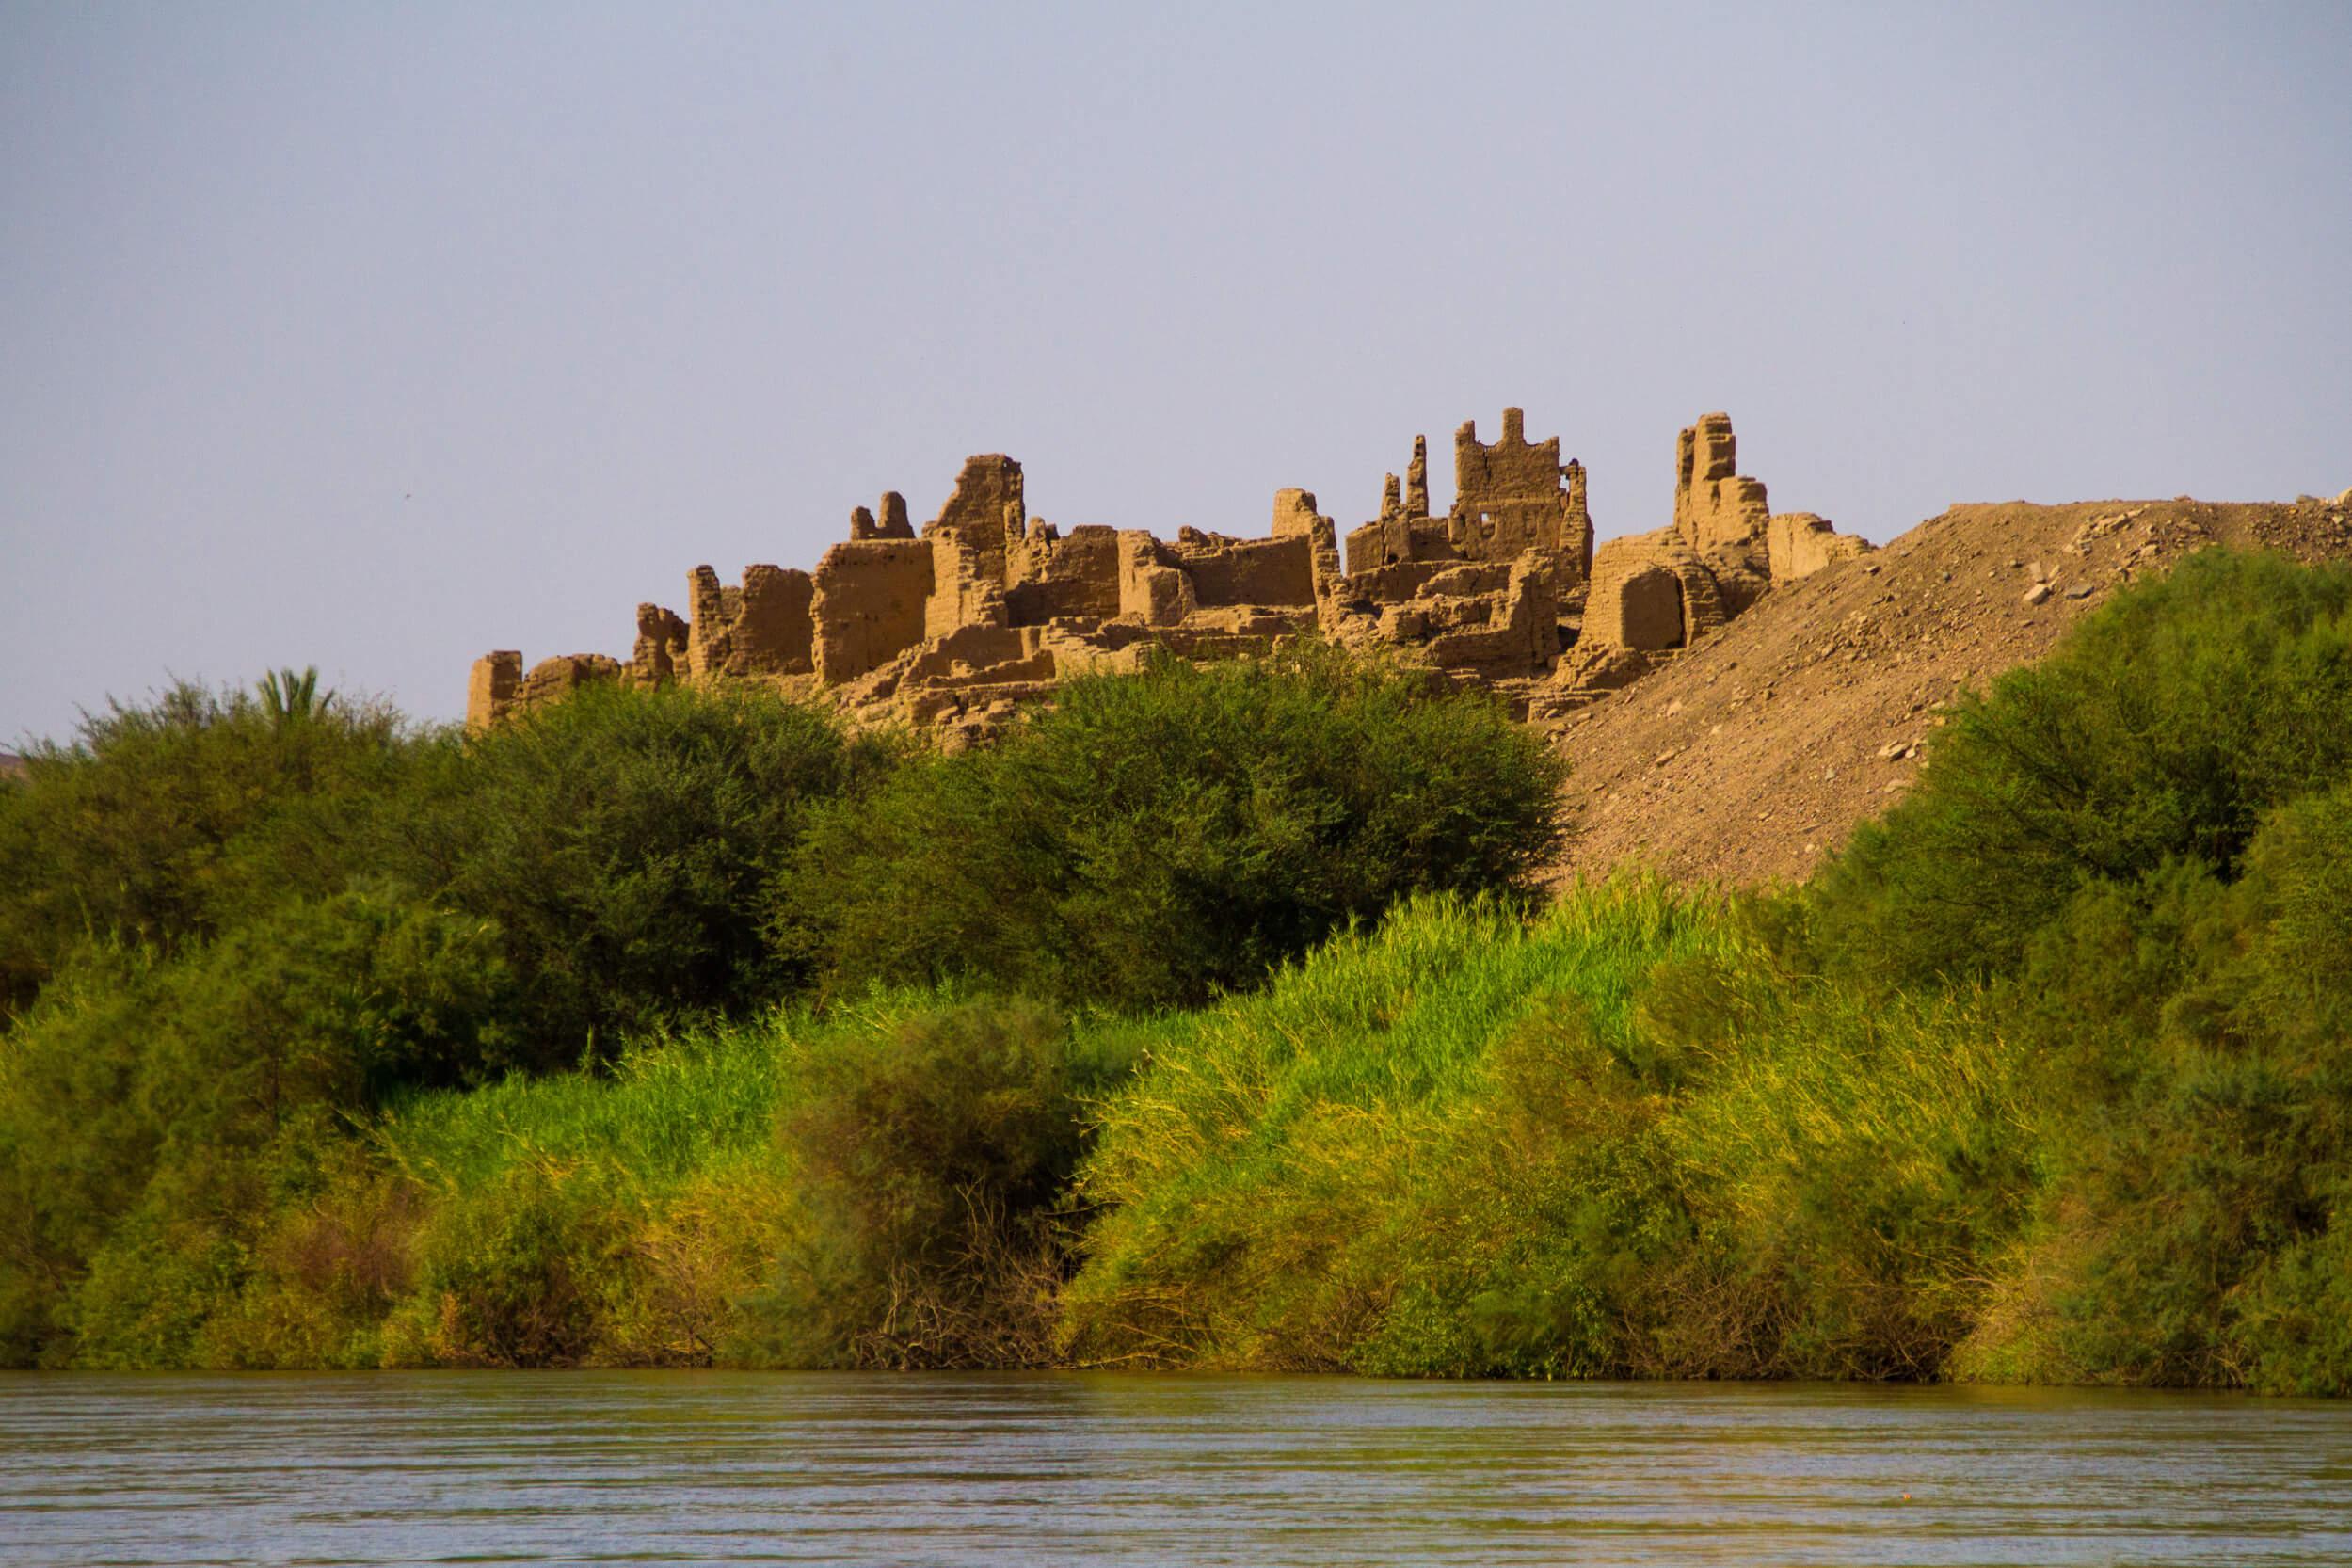 https://bubo.sk/uploads/galleries/7407/marekmeluch_sudan_saiisland.jpg